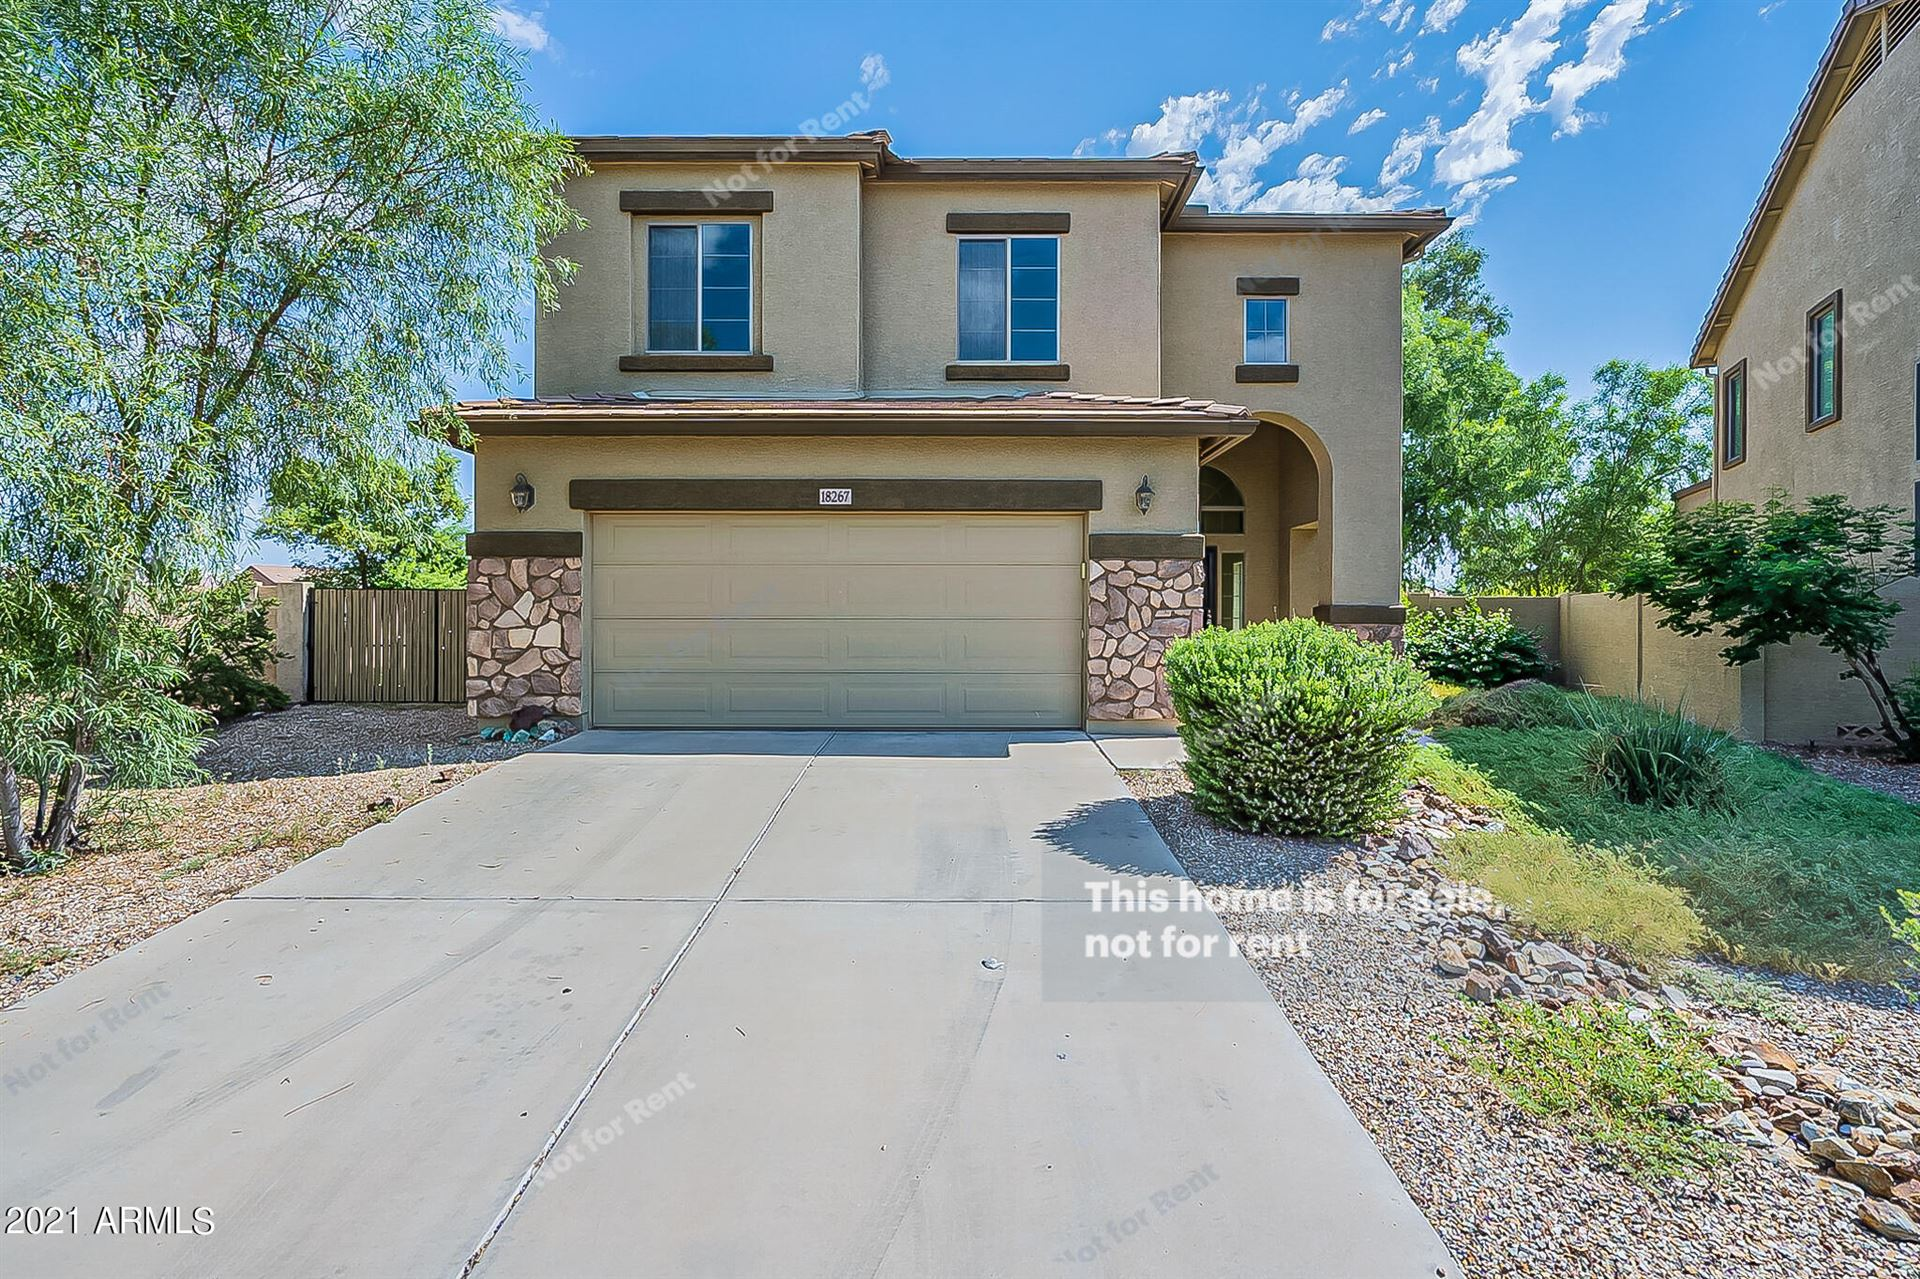 Photo for 18267 N COOK Drive, Maricopa, AZ 85138 (MLS # 6298613)